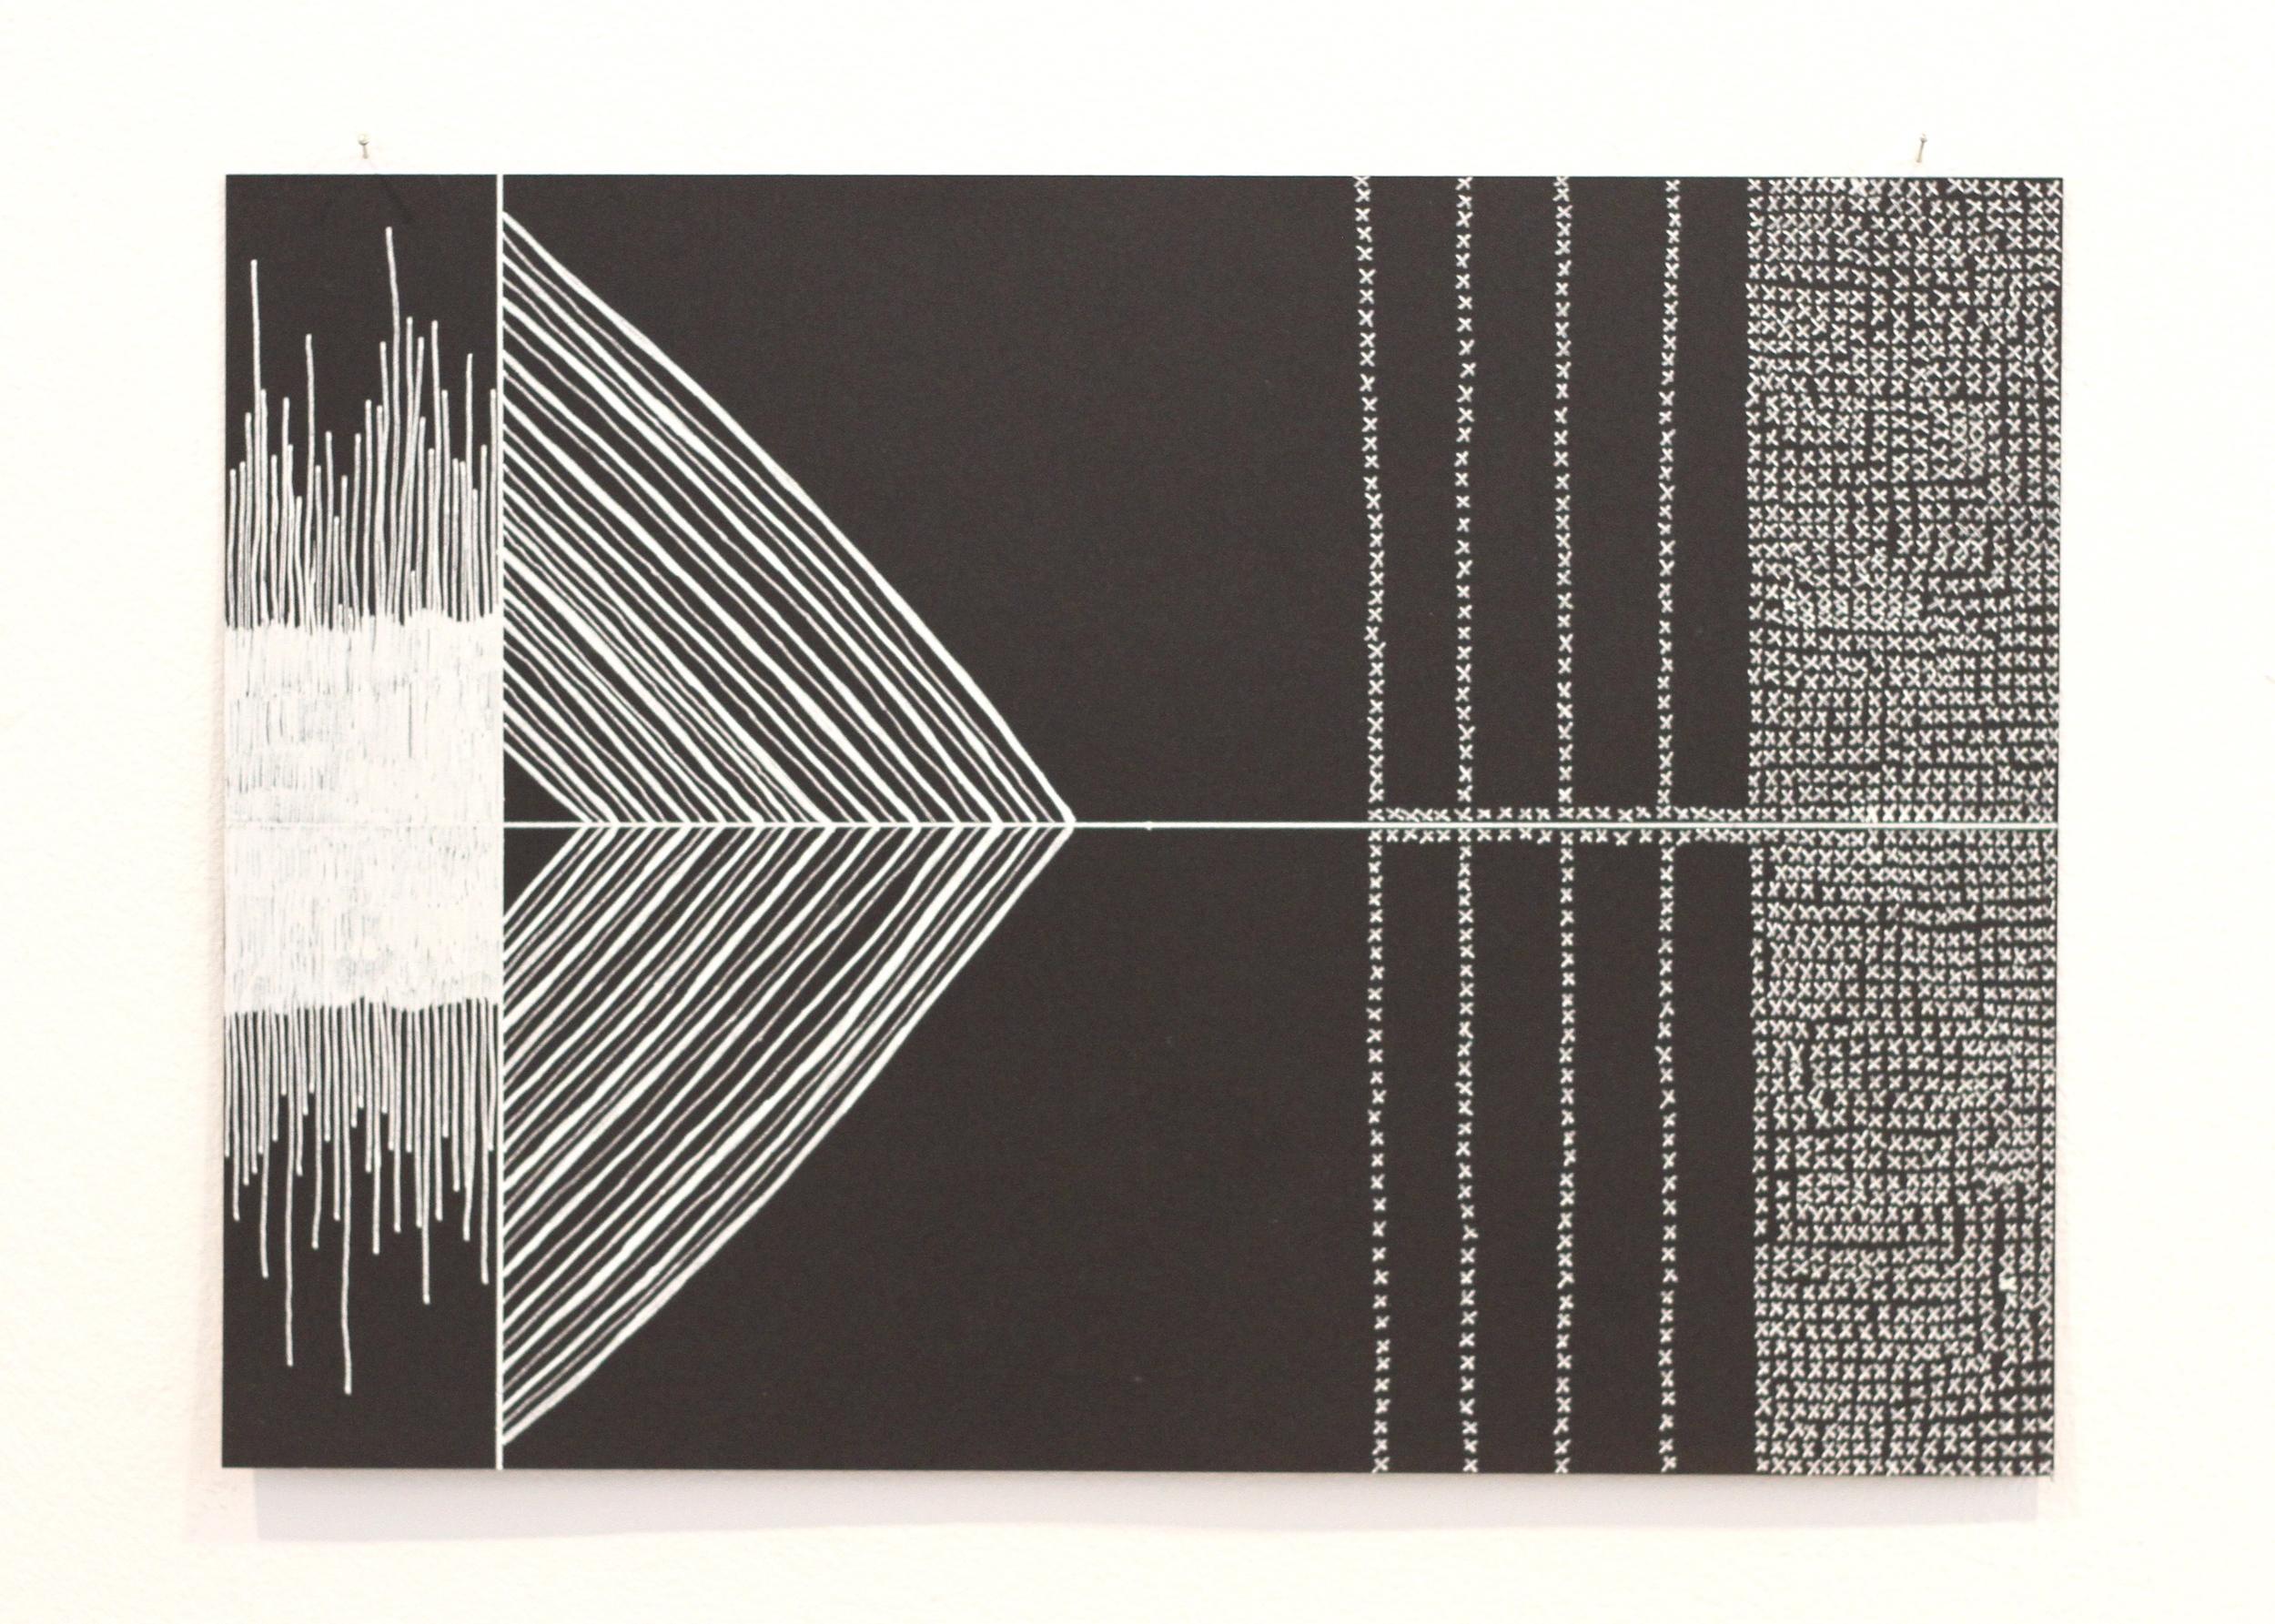 Siting you i le lalolagi / heavens 1, Léuli Eshraghi, ink on card, 21 x 29.5cm, 2014